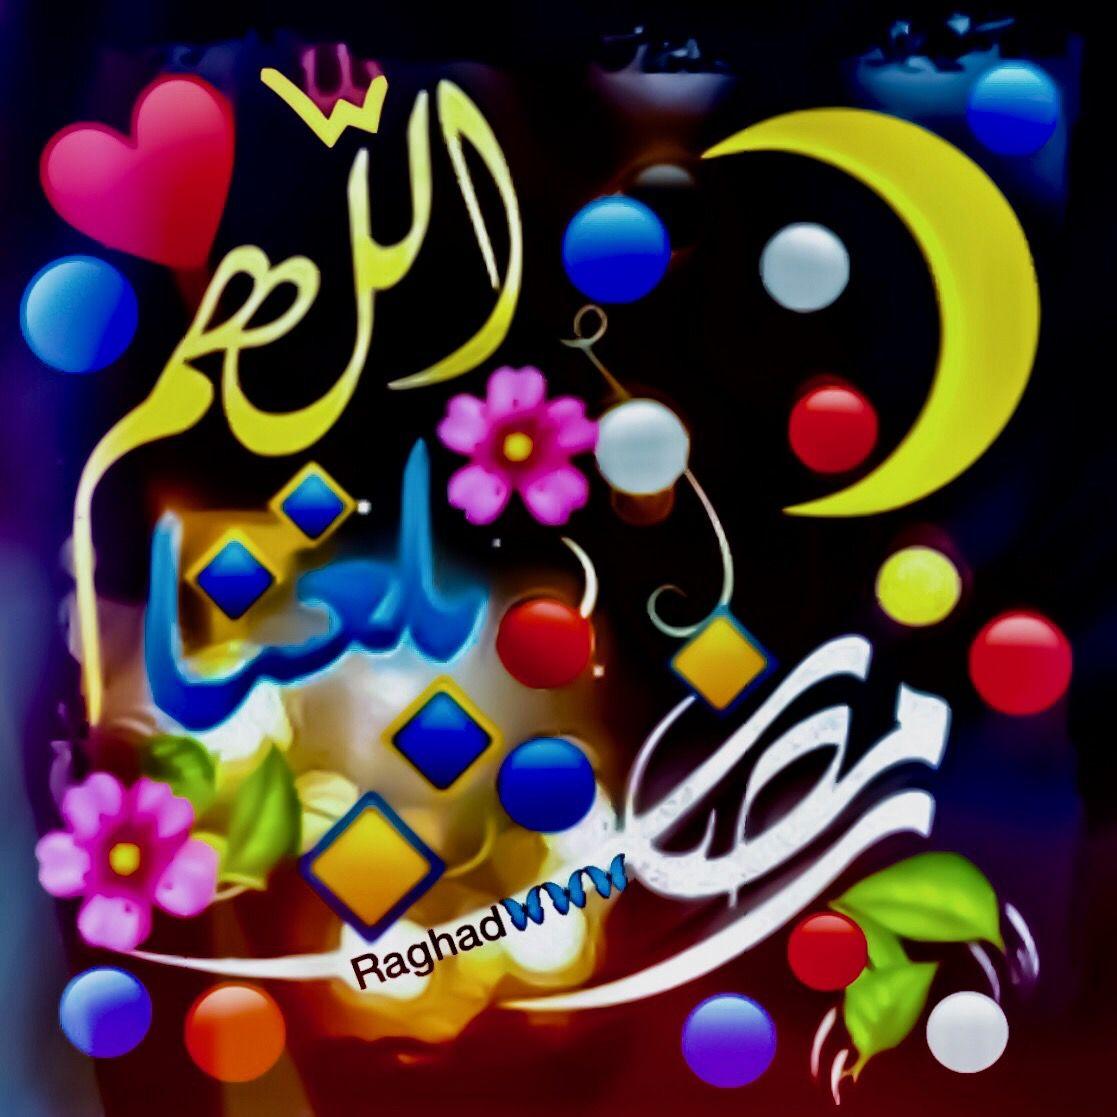 Desertrose غد ا أول يوم من شهر رمضان المبارك أعاده الله عليكم بالخير واليمن والبركات وبلغنا الله وإياكم صيامه وقيام Ramadan Kareem Ramadan Adha Mubarak